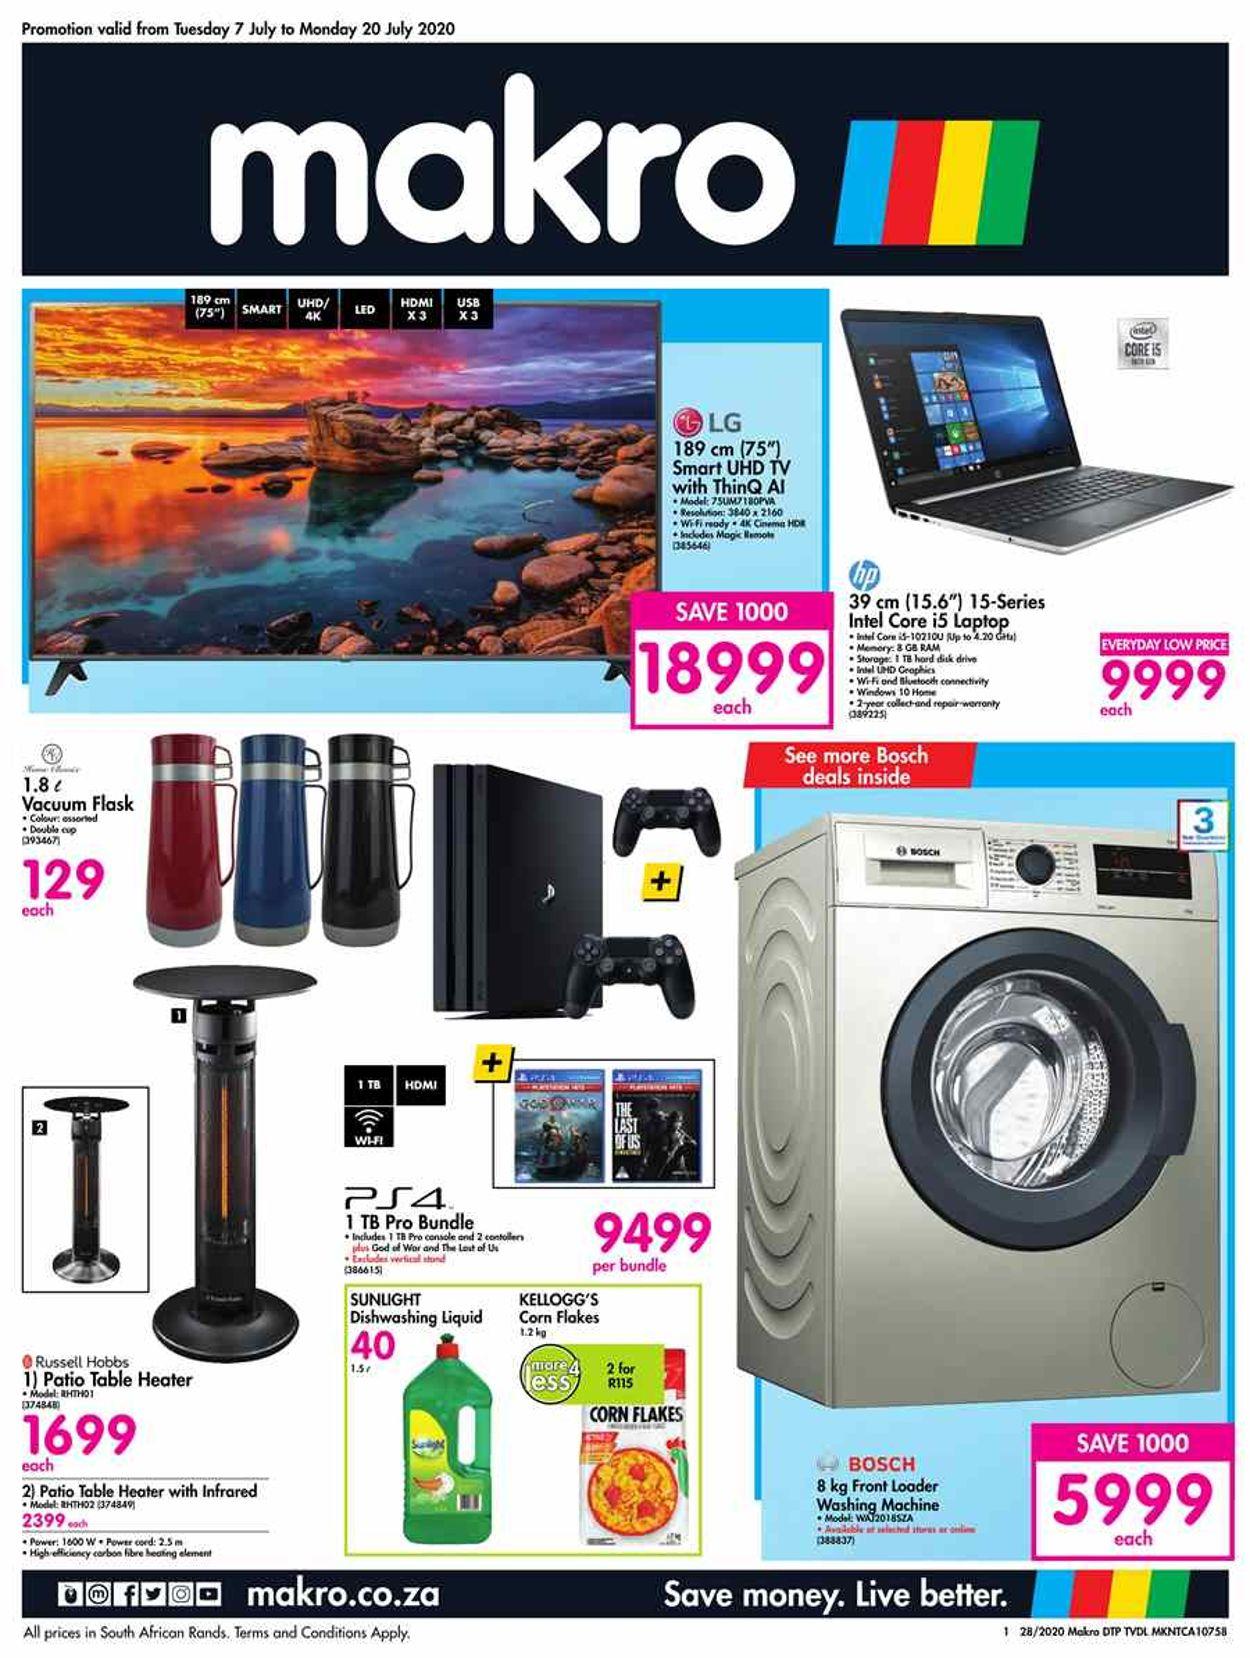 Makro Catalogue - 2020/07/07-2020/07/20